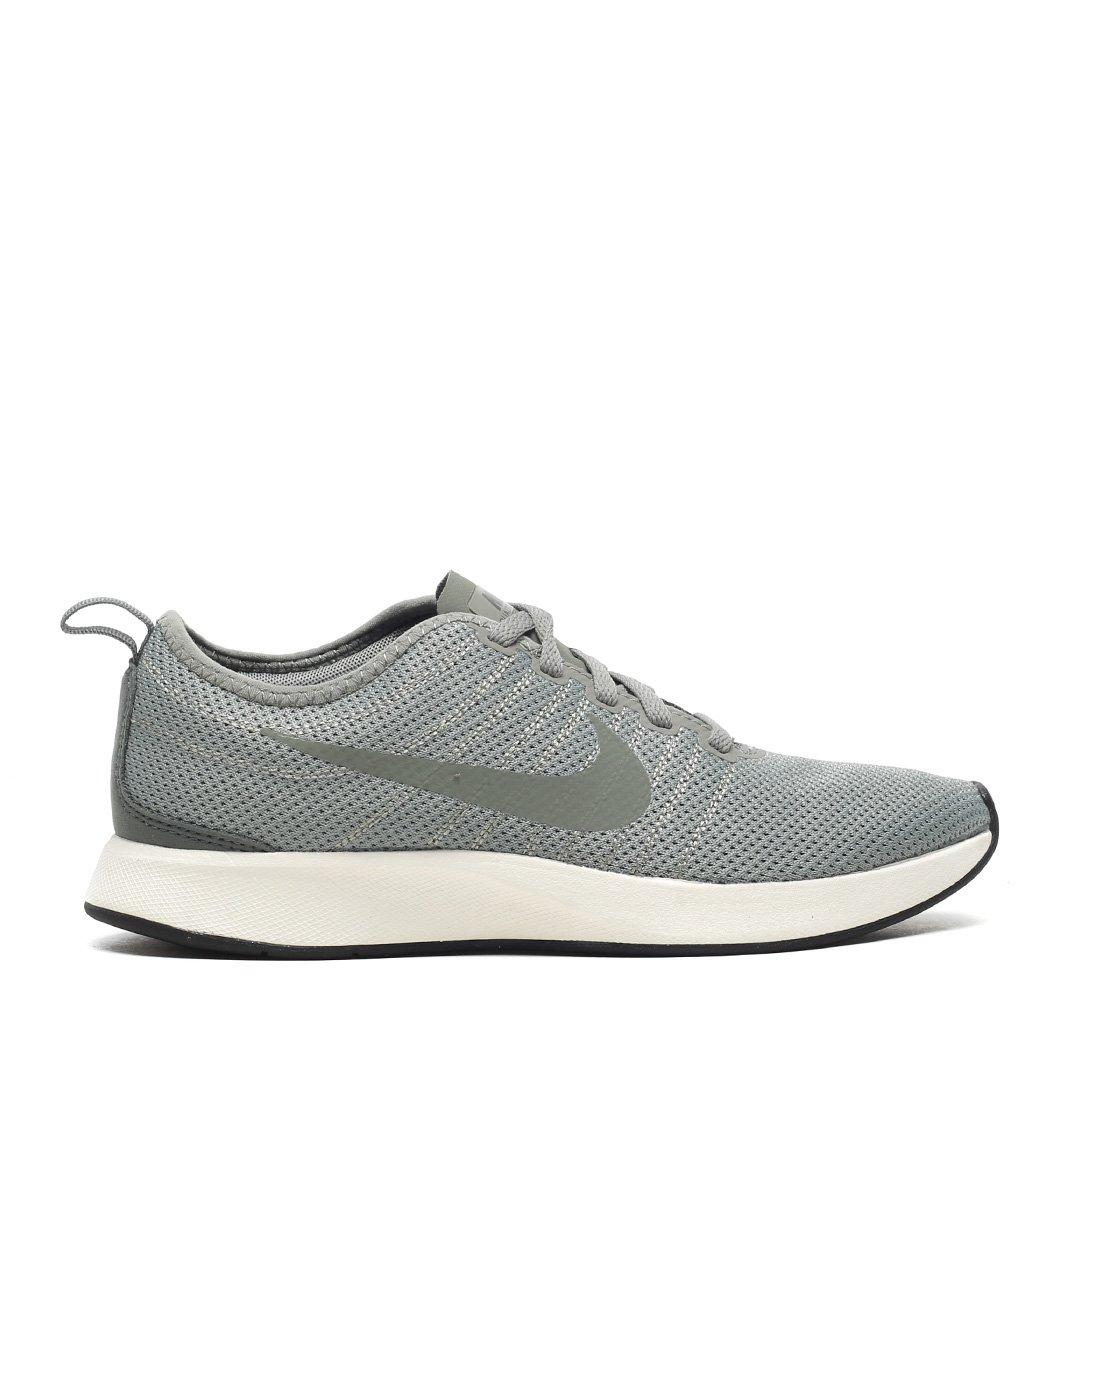 94dd8769f7133 Galleon - Nike DualTone Racer Women s Running Shoes Dark Stucco 917682-002  (10 B(M) US)